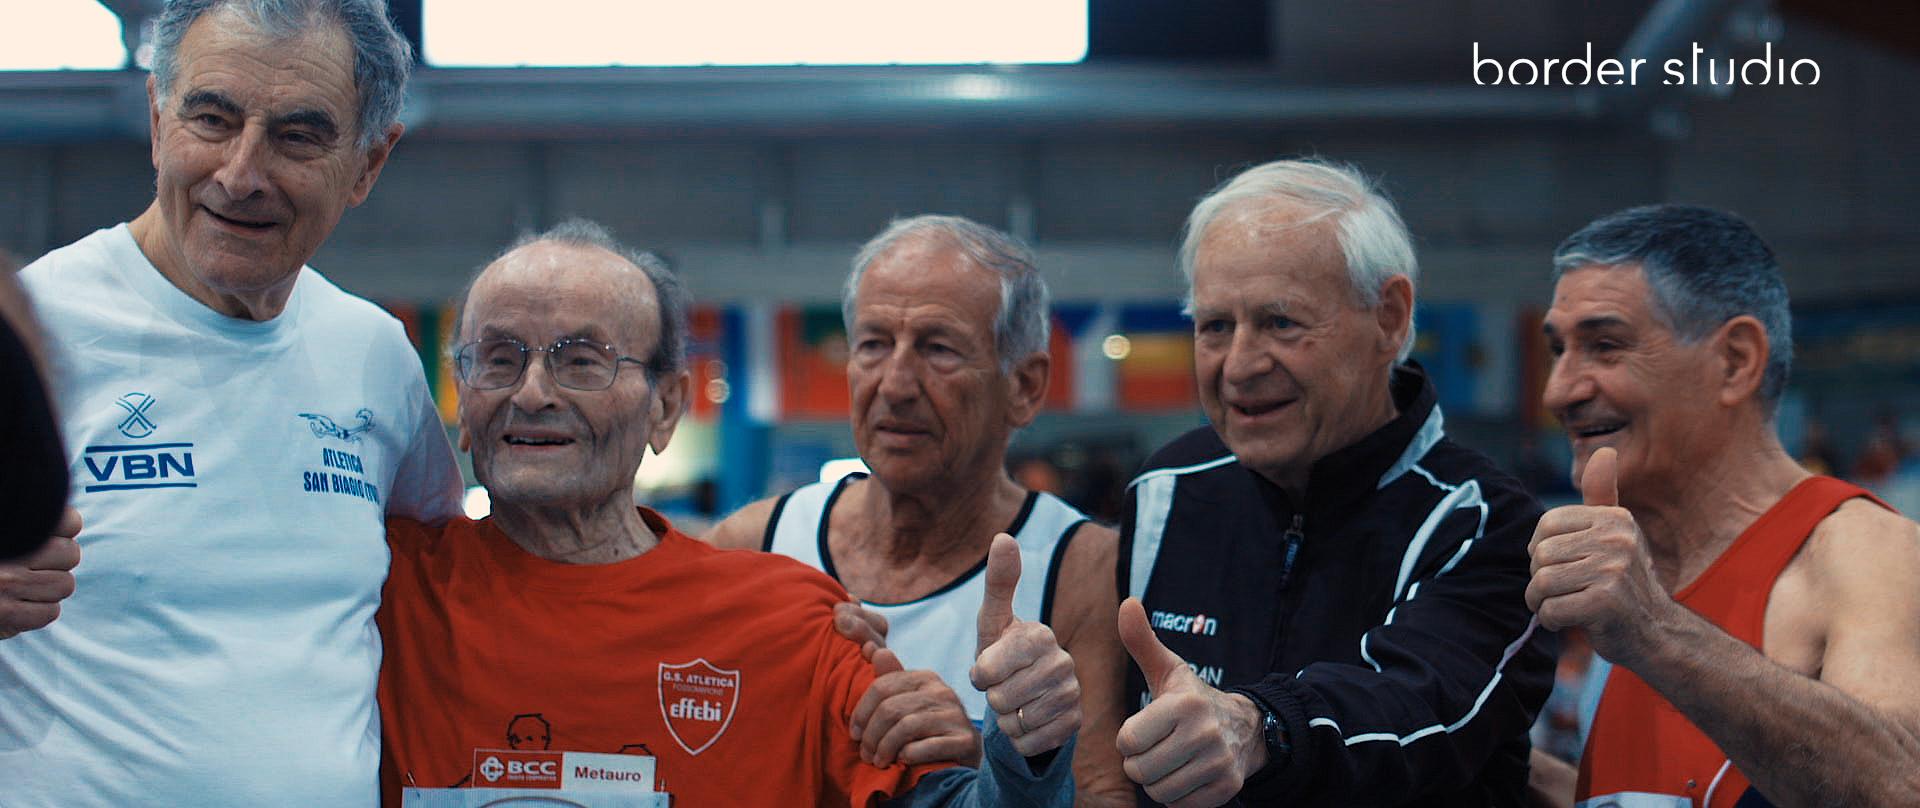 Giuseppe Ottaviani, Giorgio Maria Bortolozzi - Campionati italiani master indoor 2016 07